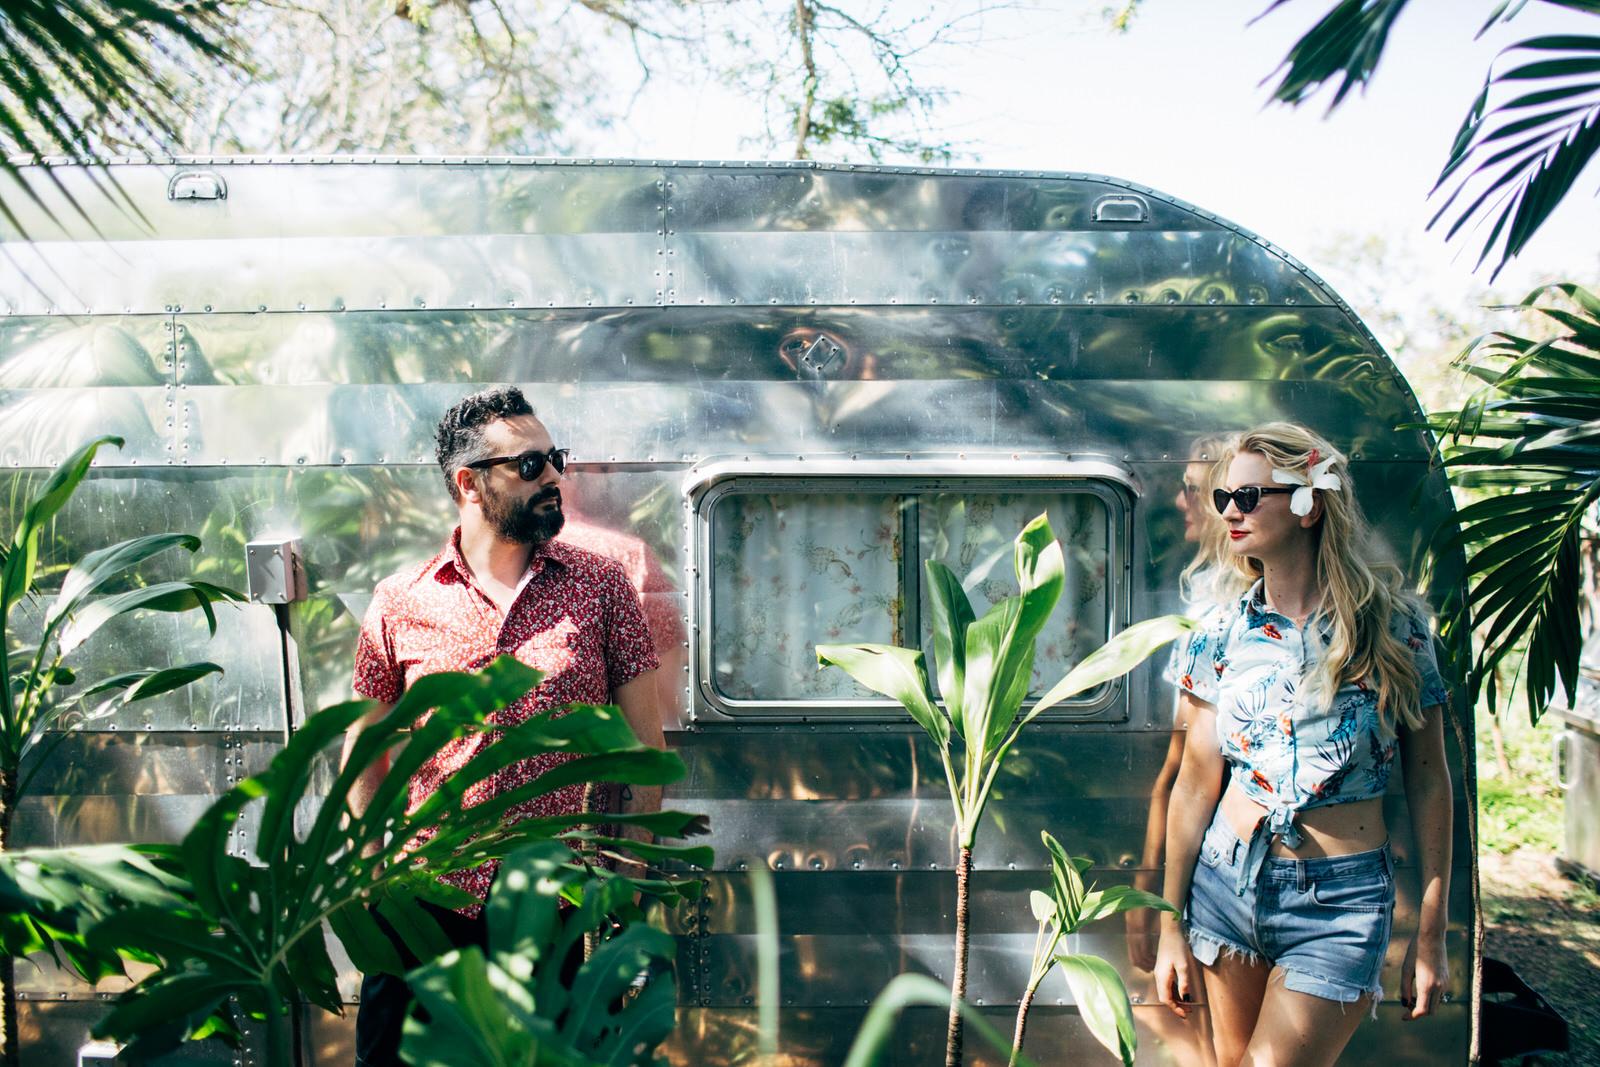 paula & i on honeymoon, hawaii. photo by amanda thomsen